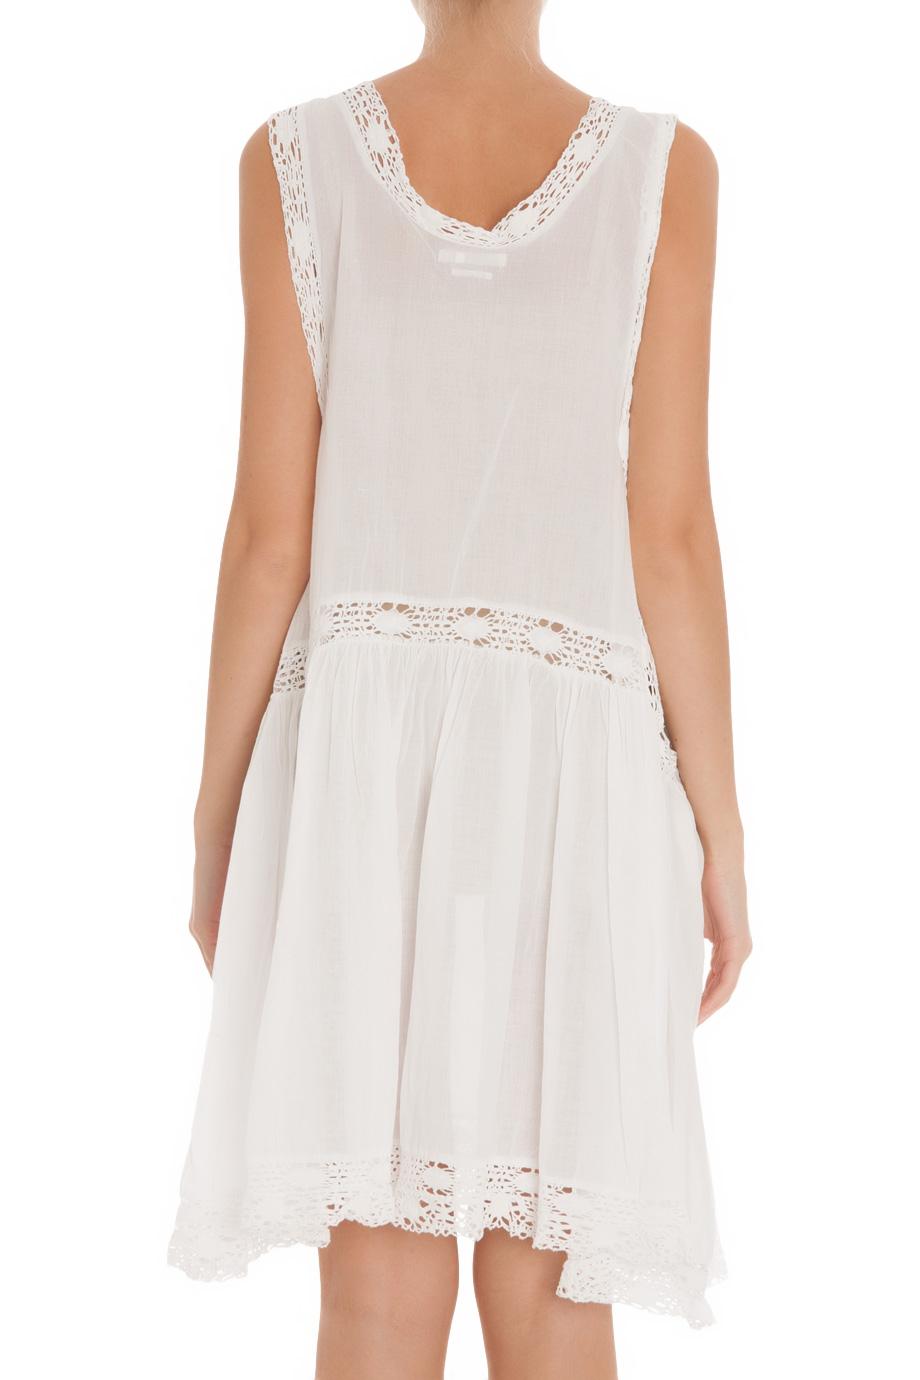 Lyst toile isabel marant dixie cotton voile tie dress for Isabel marant shirt dress